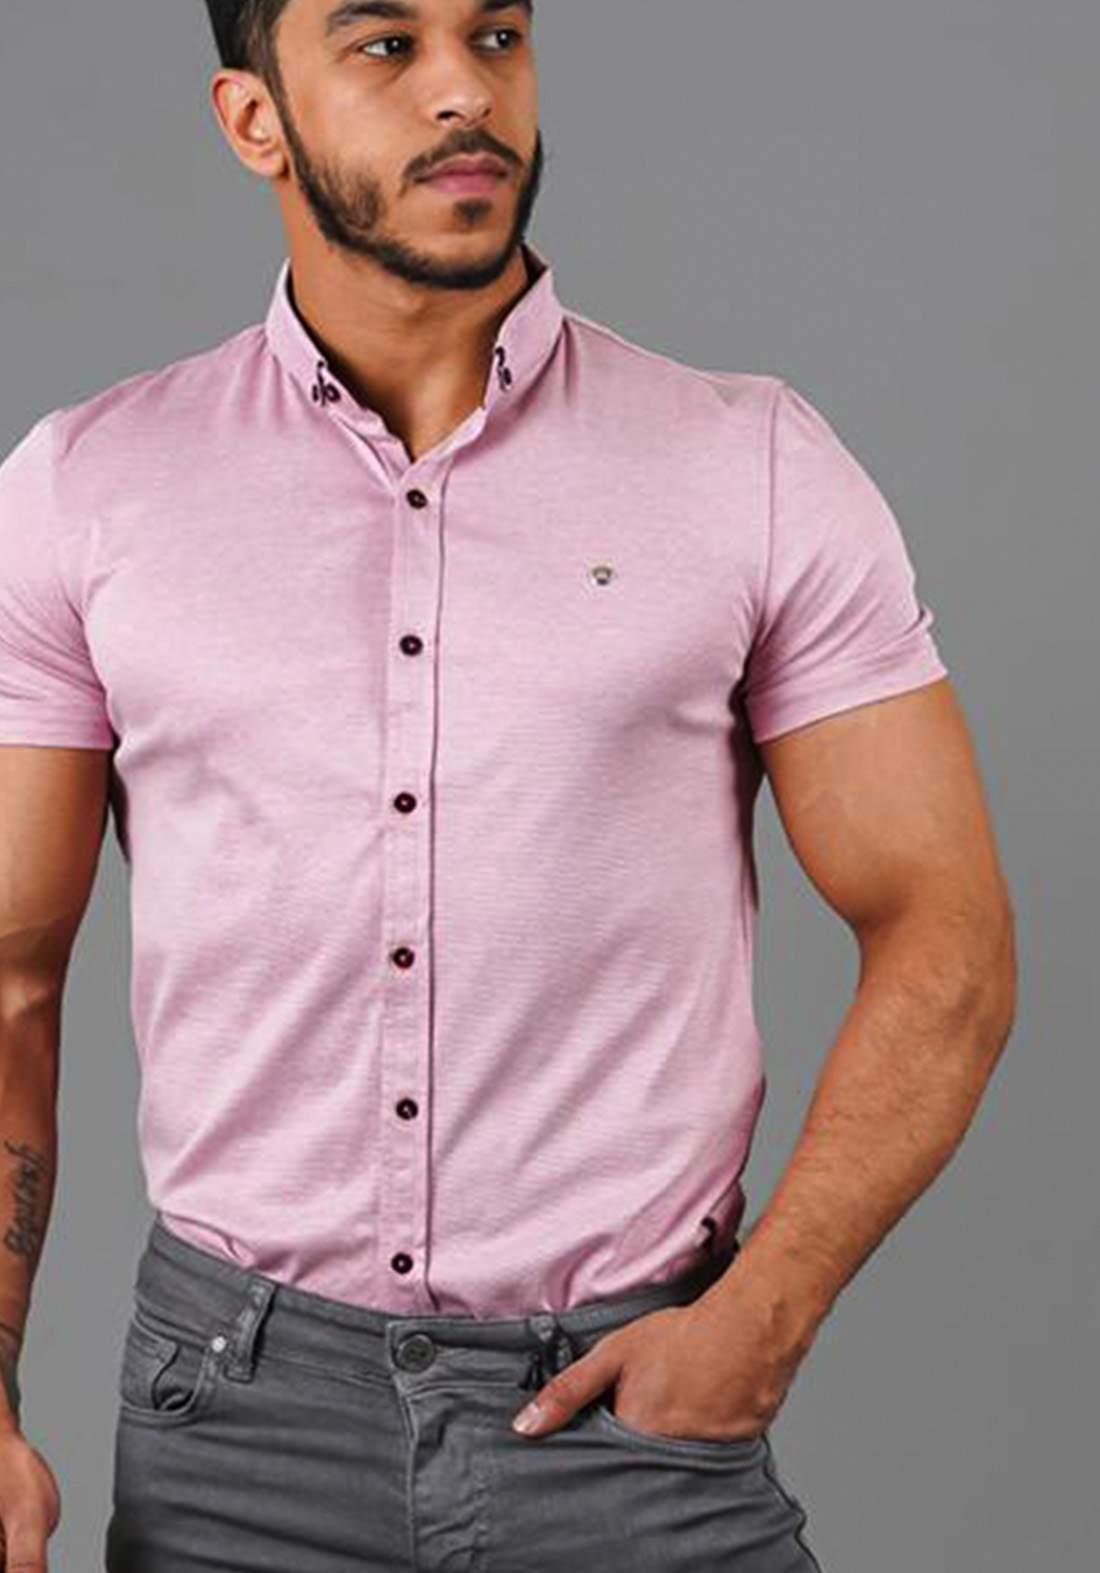 قميص رجالي بنصف كم وردي اللون